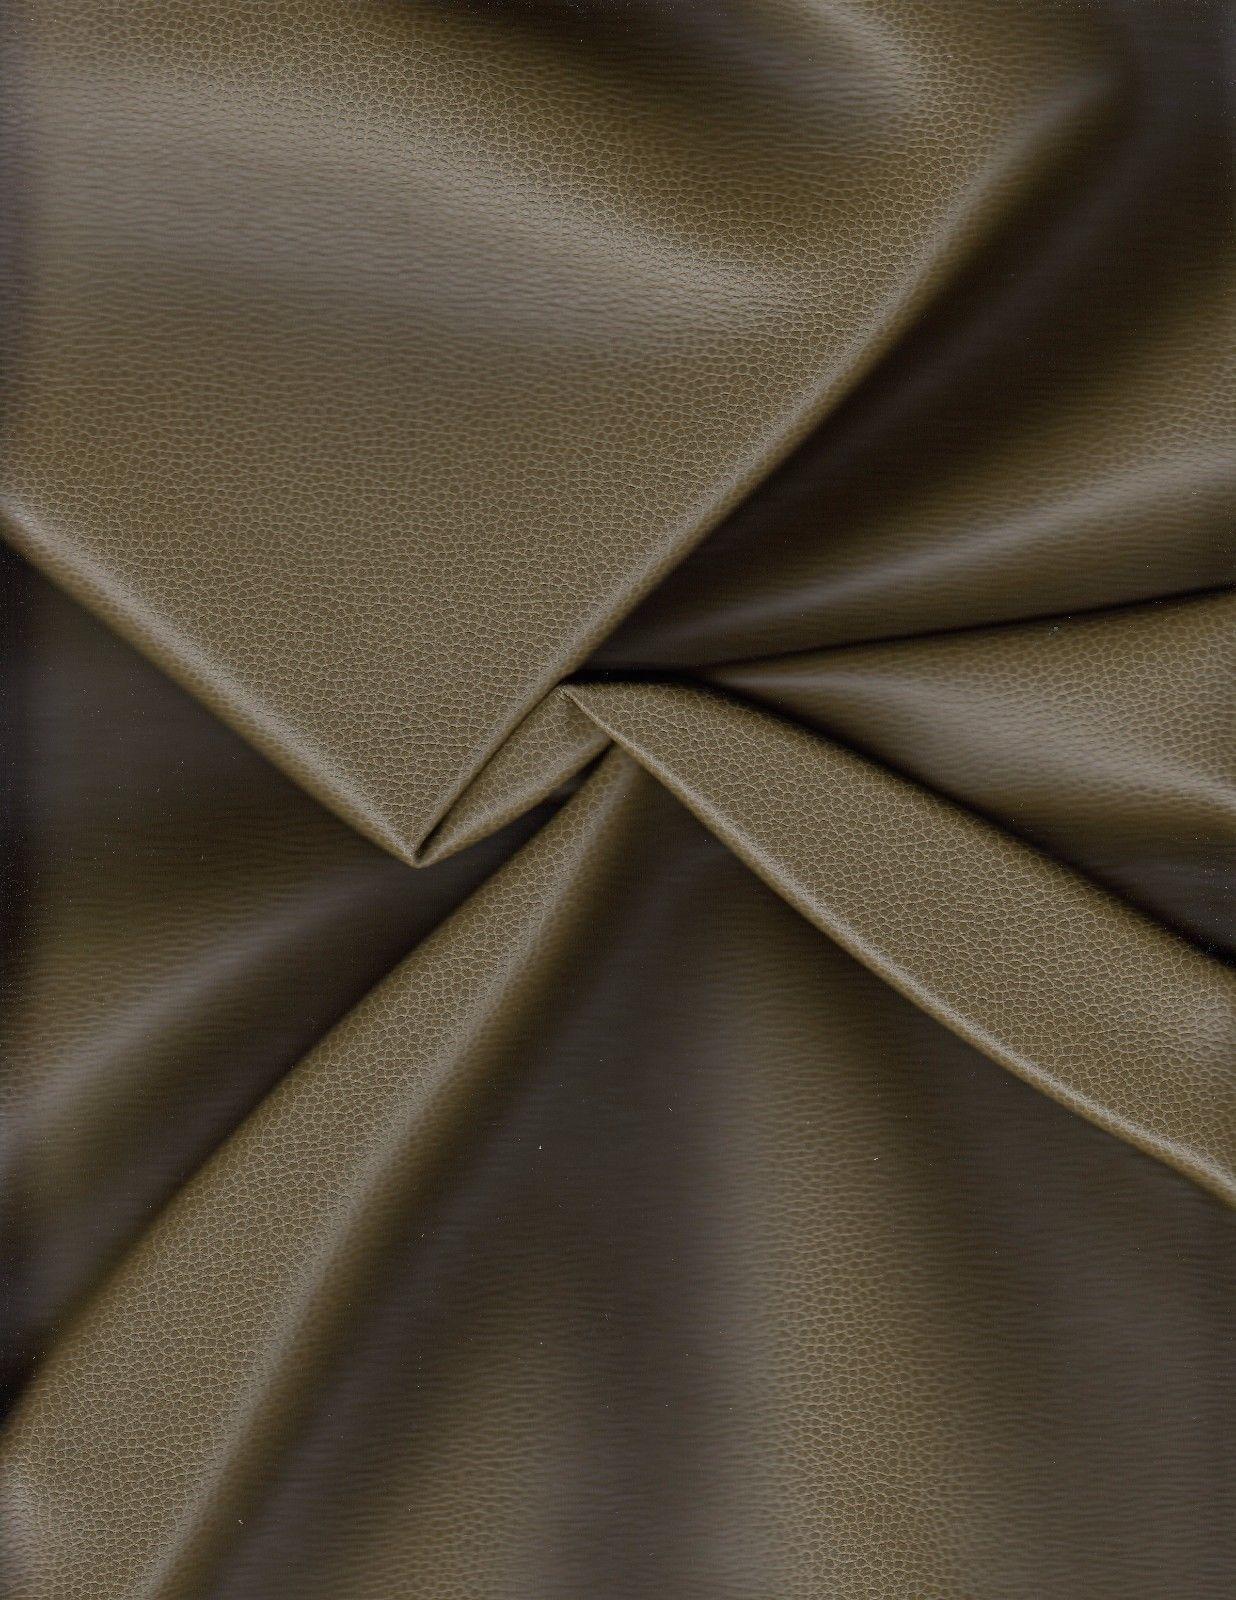 Ultrafabrics Polster Kunstleder 363-4514 Promessa Moosgrün 5.9m CW2